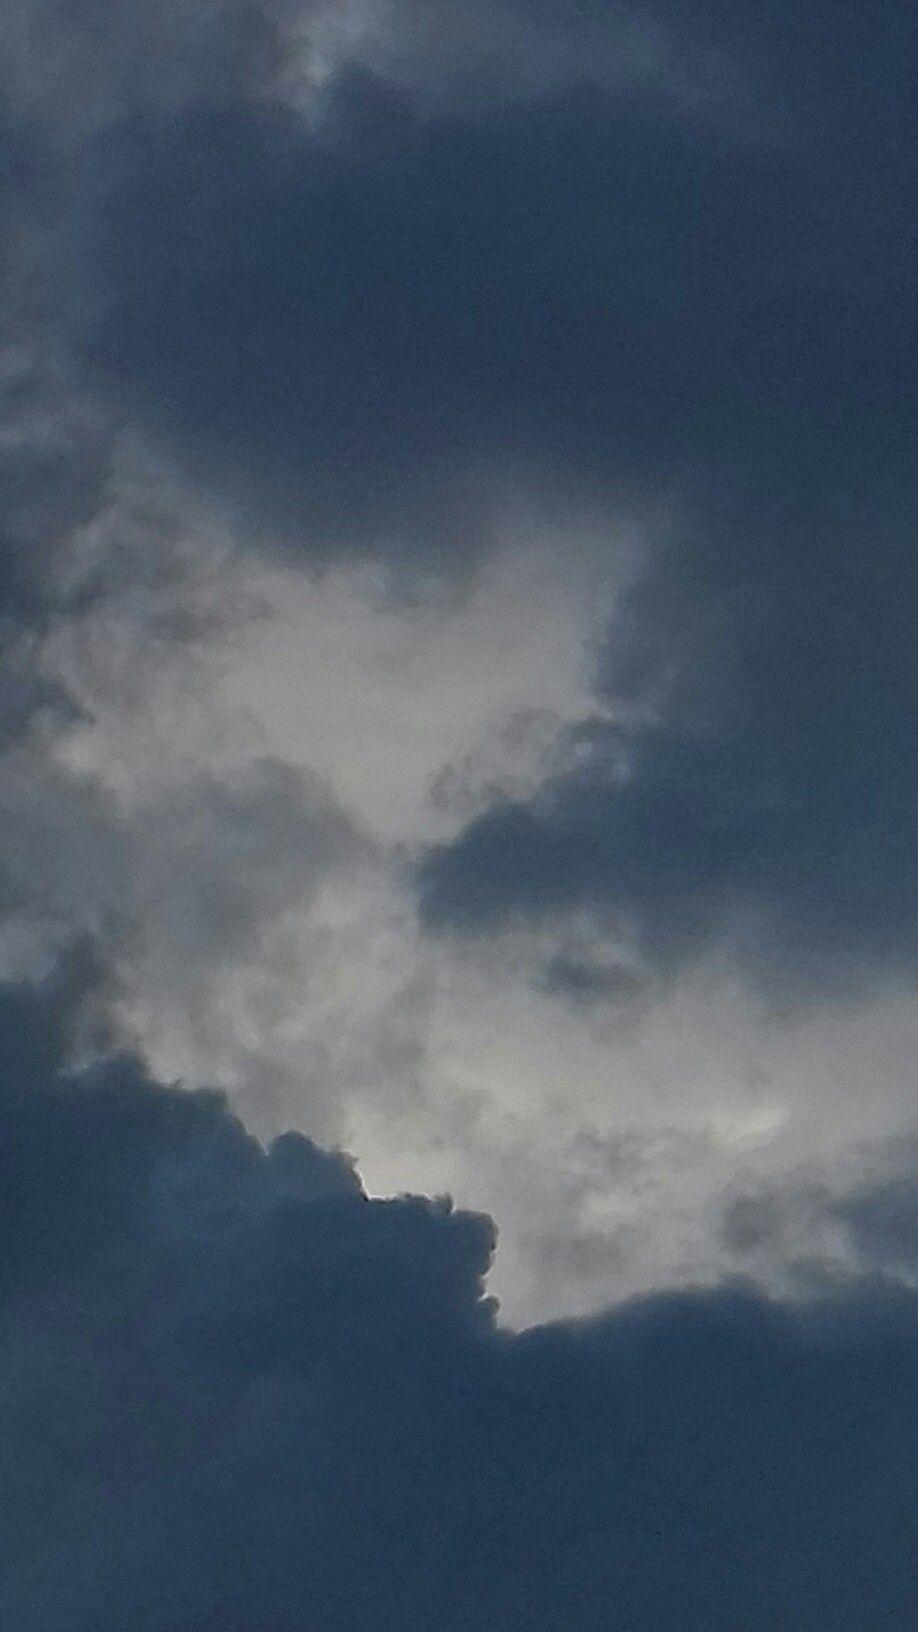 Sjy Storm Air Breathe Clouds Aesthetic Melancholic